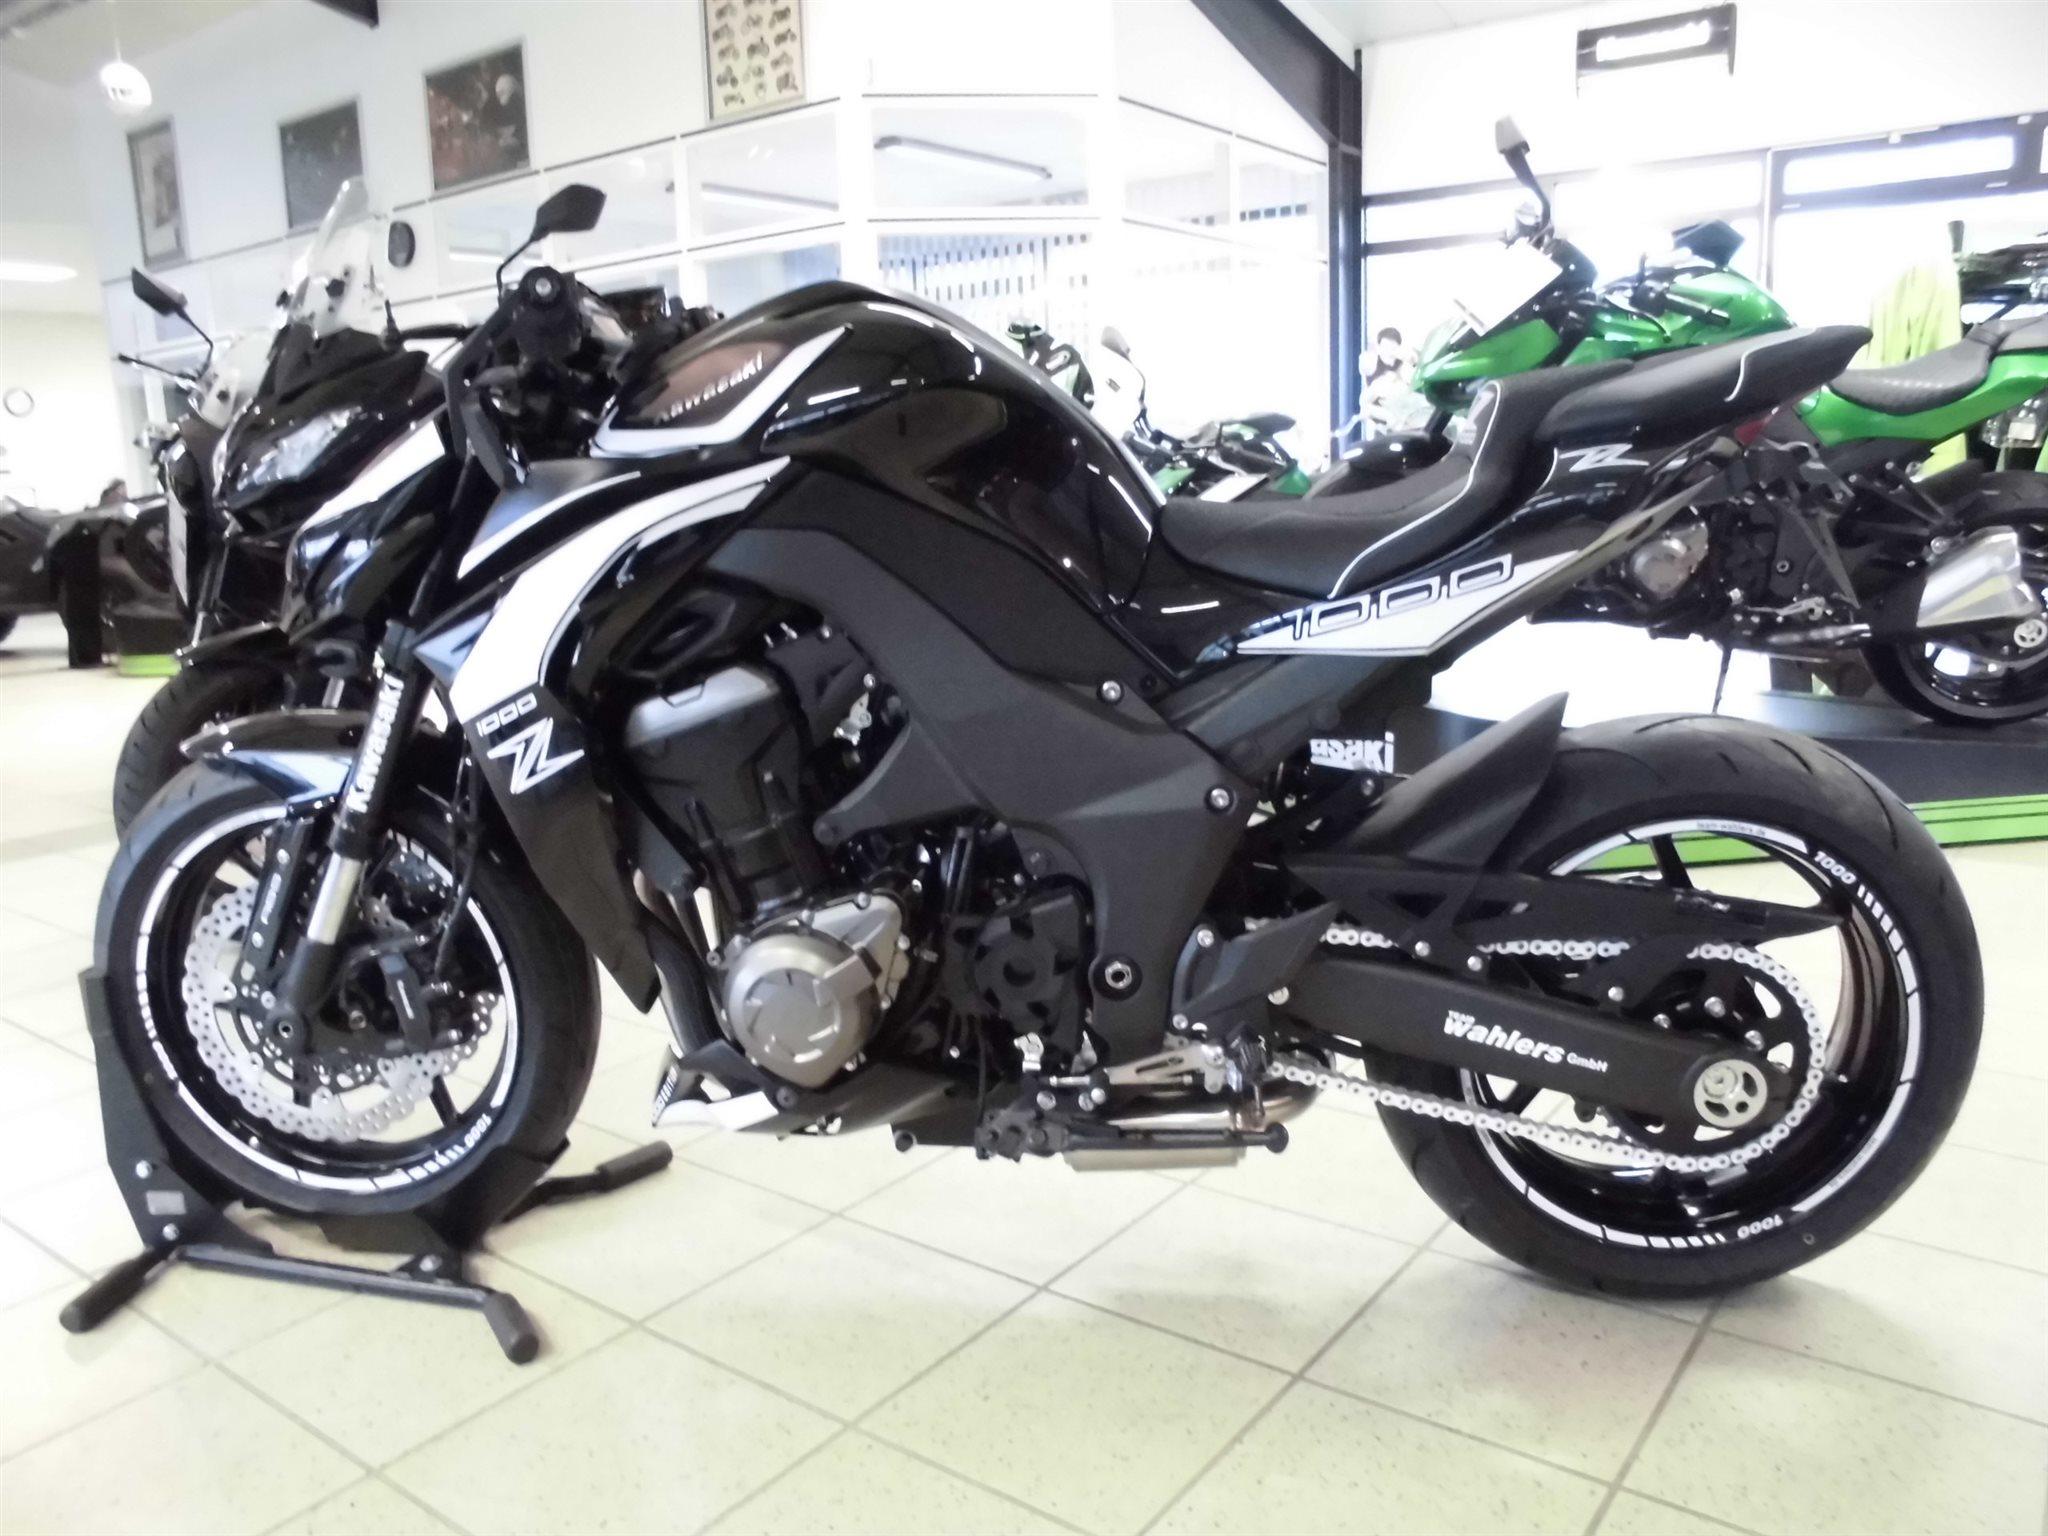 Umgebautes Motorrad Kawasaki Z 1000 Black Edition von